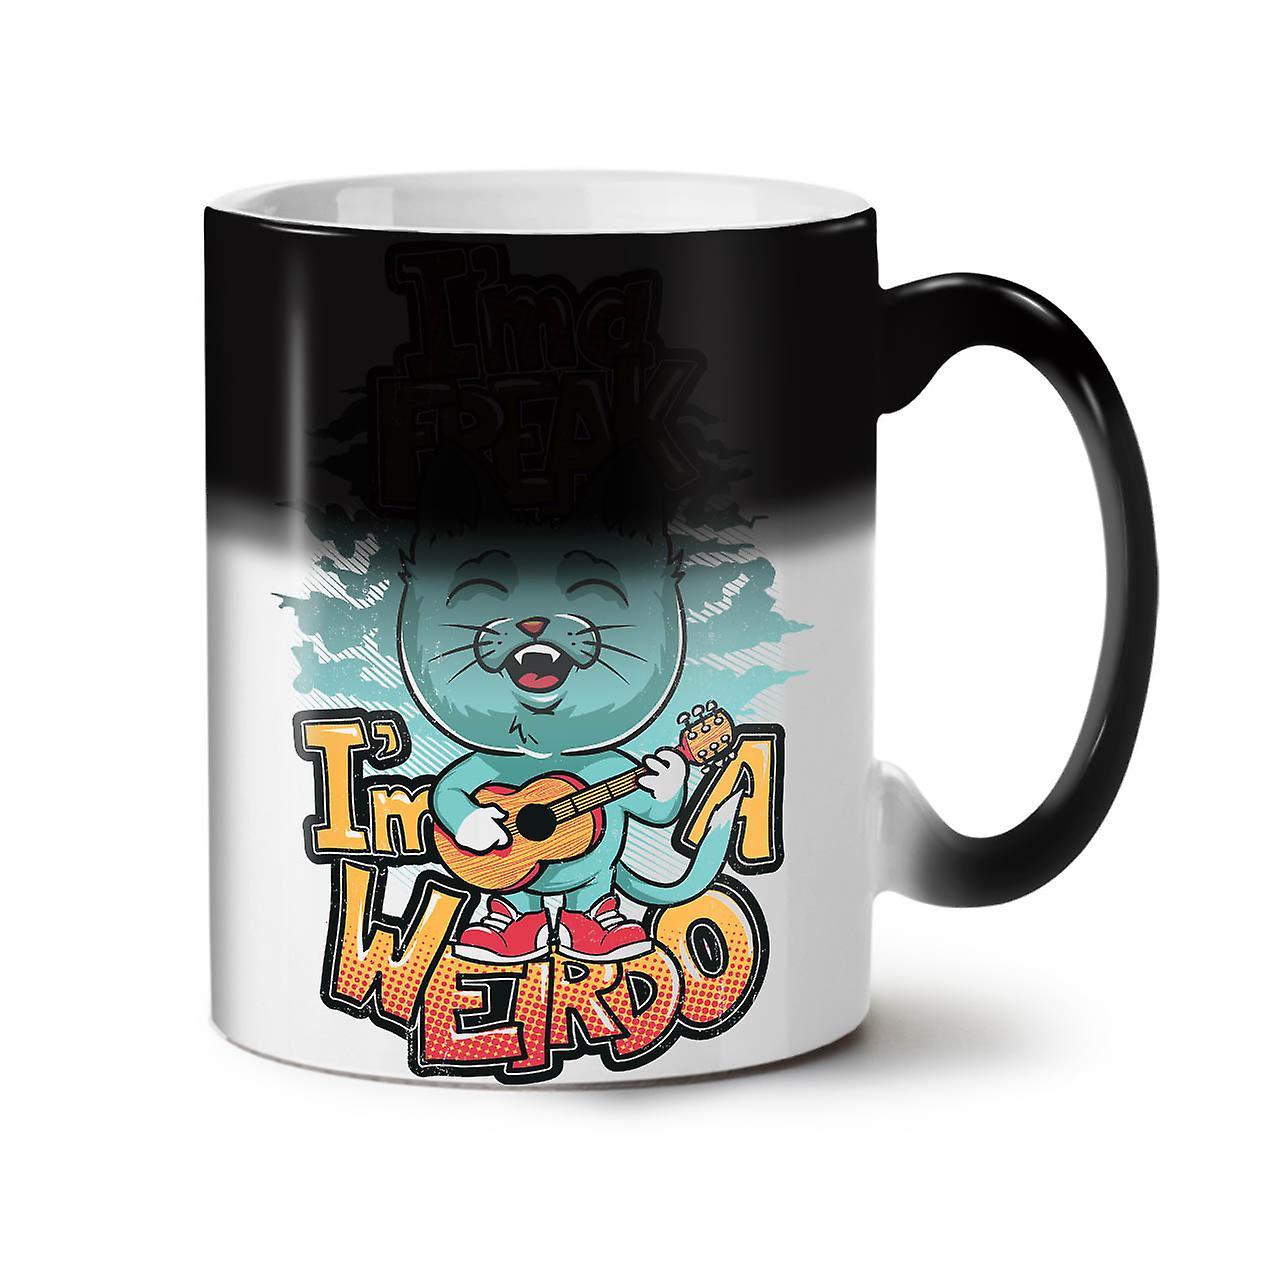 Ima Freak Weirdo Cute NEW Black Colour Changing Tea Coffee Ceramic Mug 11 oz   Wellcoda